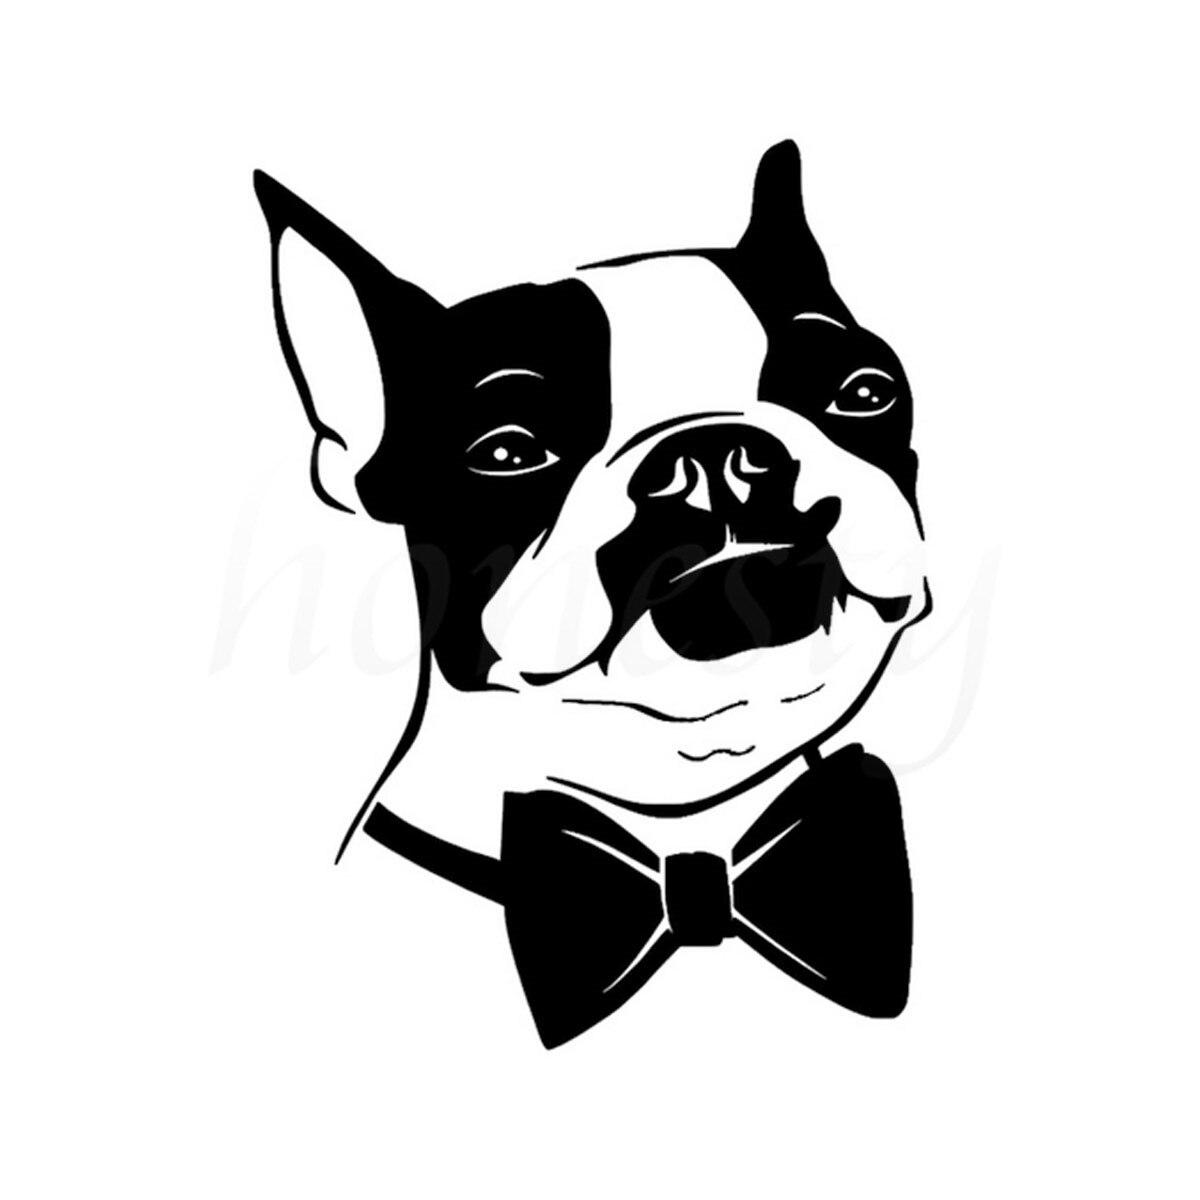 Bow Tie Boston Terrier Dog Vinyl Decal Wall Home Glass Window Door Laptop Car Stickers Car Styling Truck Black 11.5cmX15.3cm